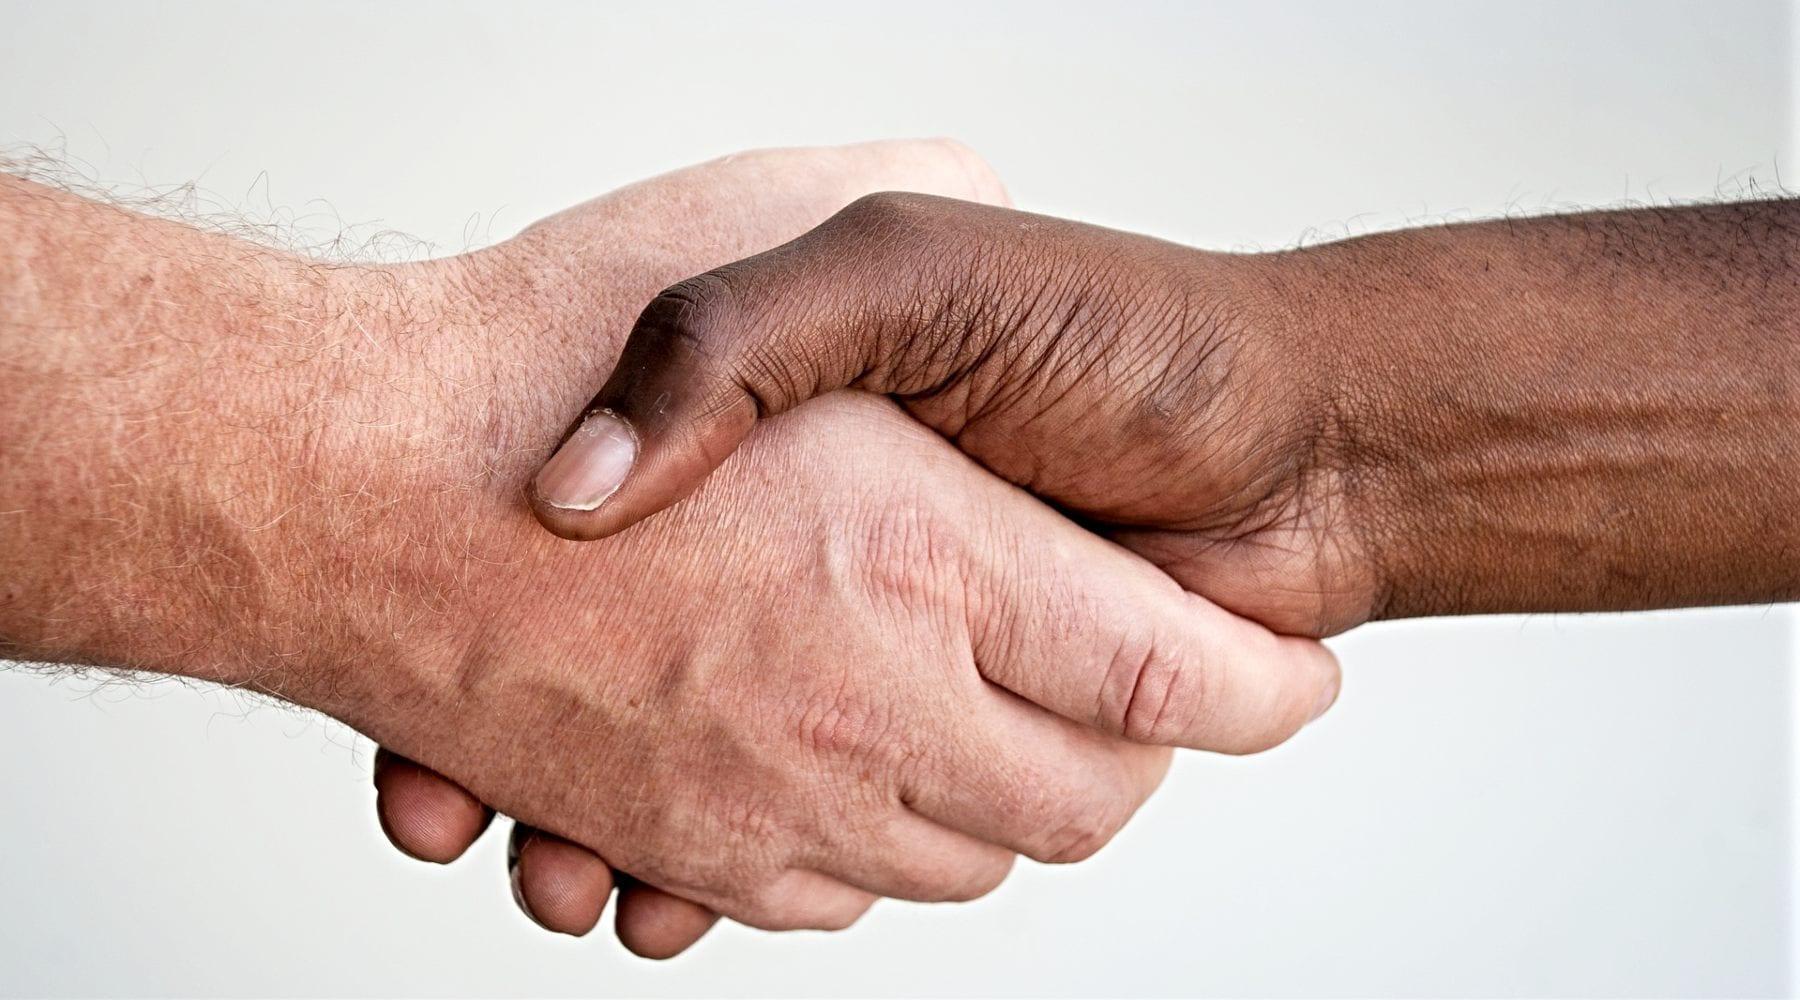 Breaking Down Racial Roadblocks in Theological Education